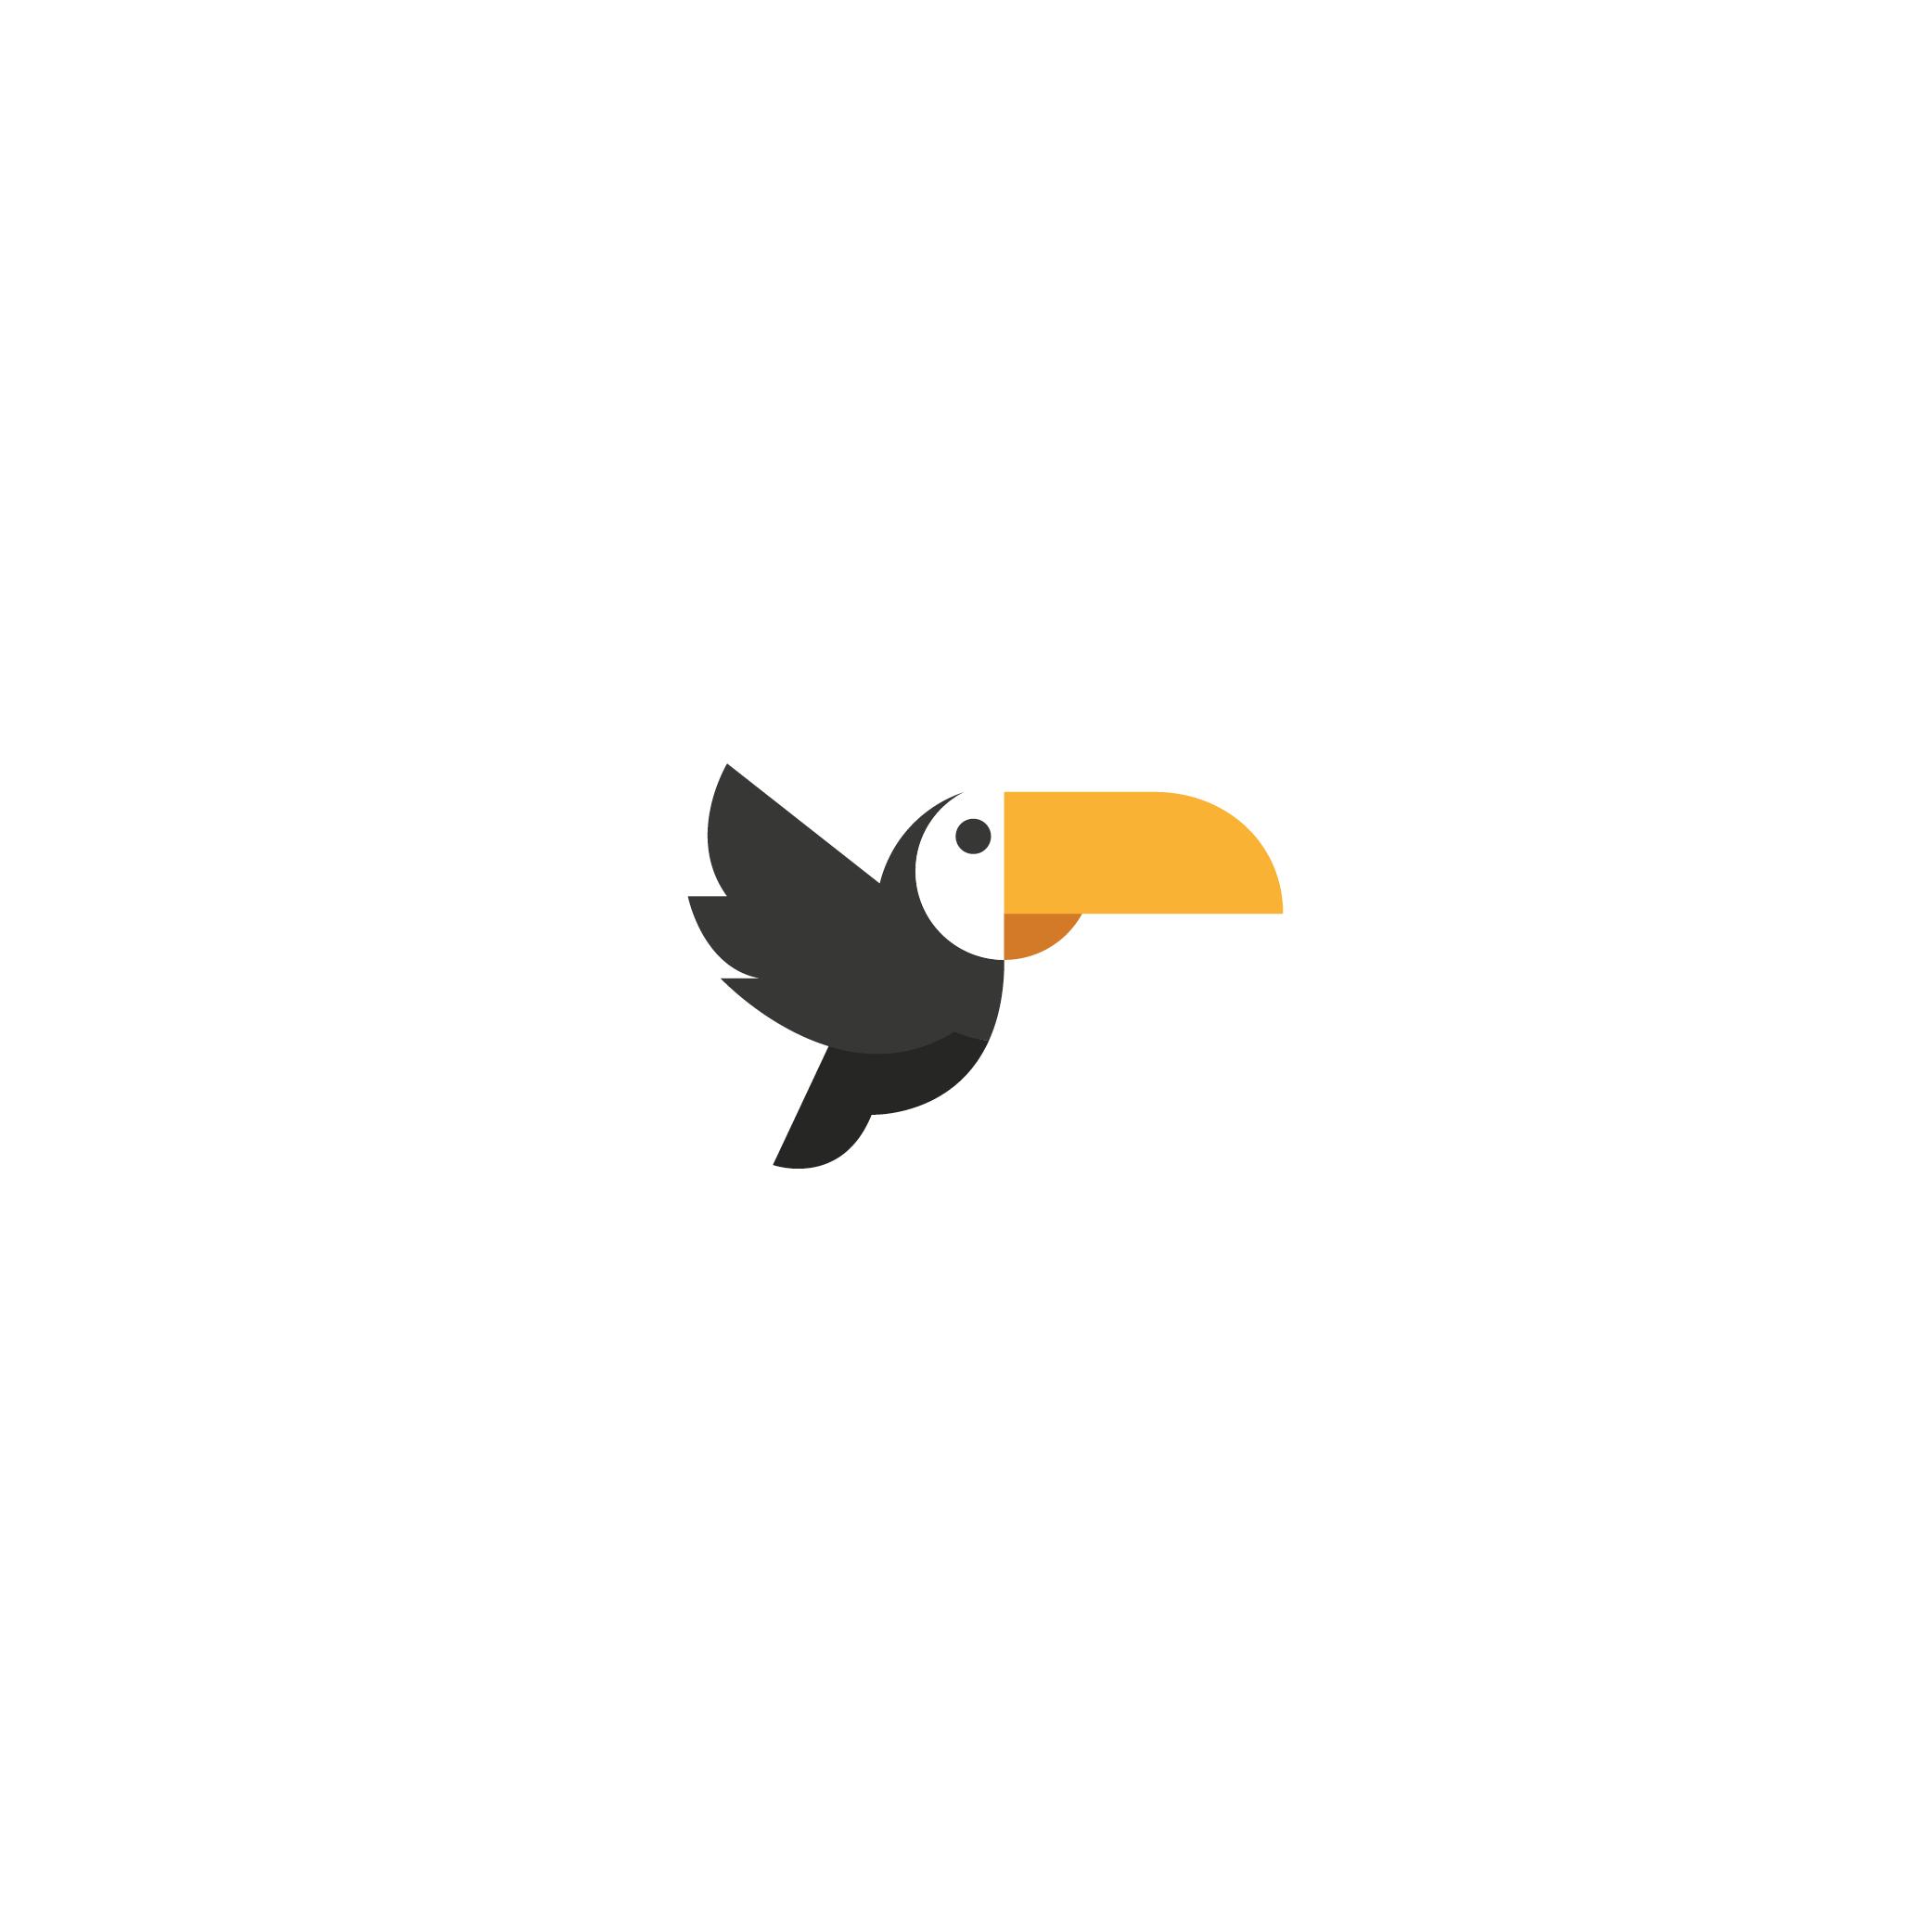 Toucan-01.png